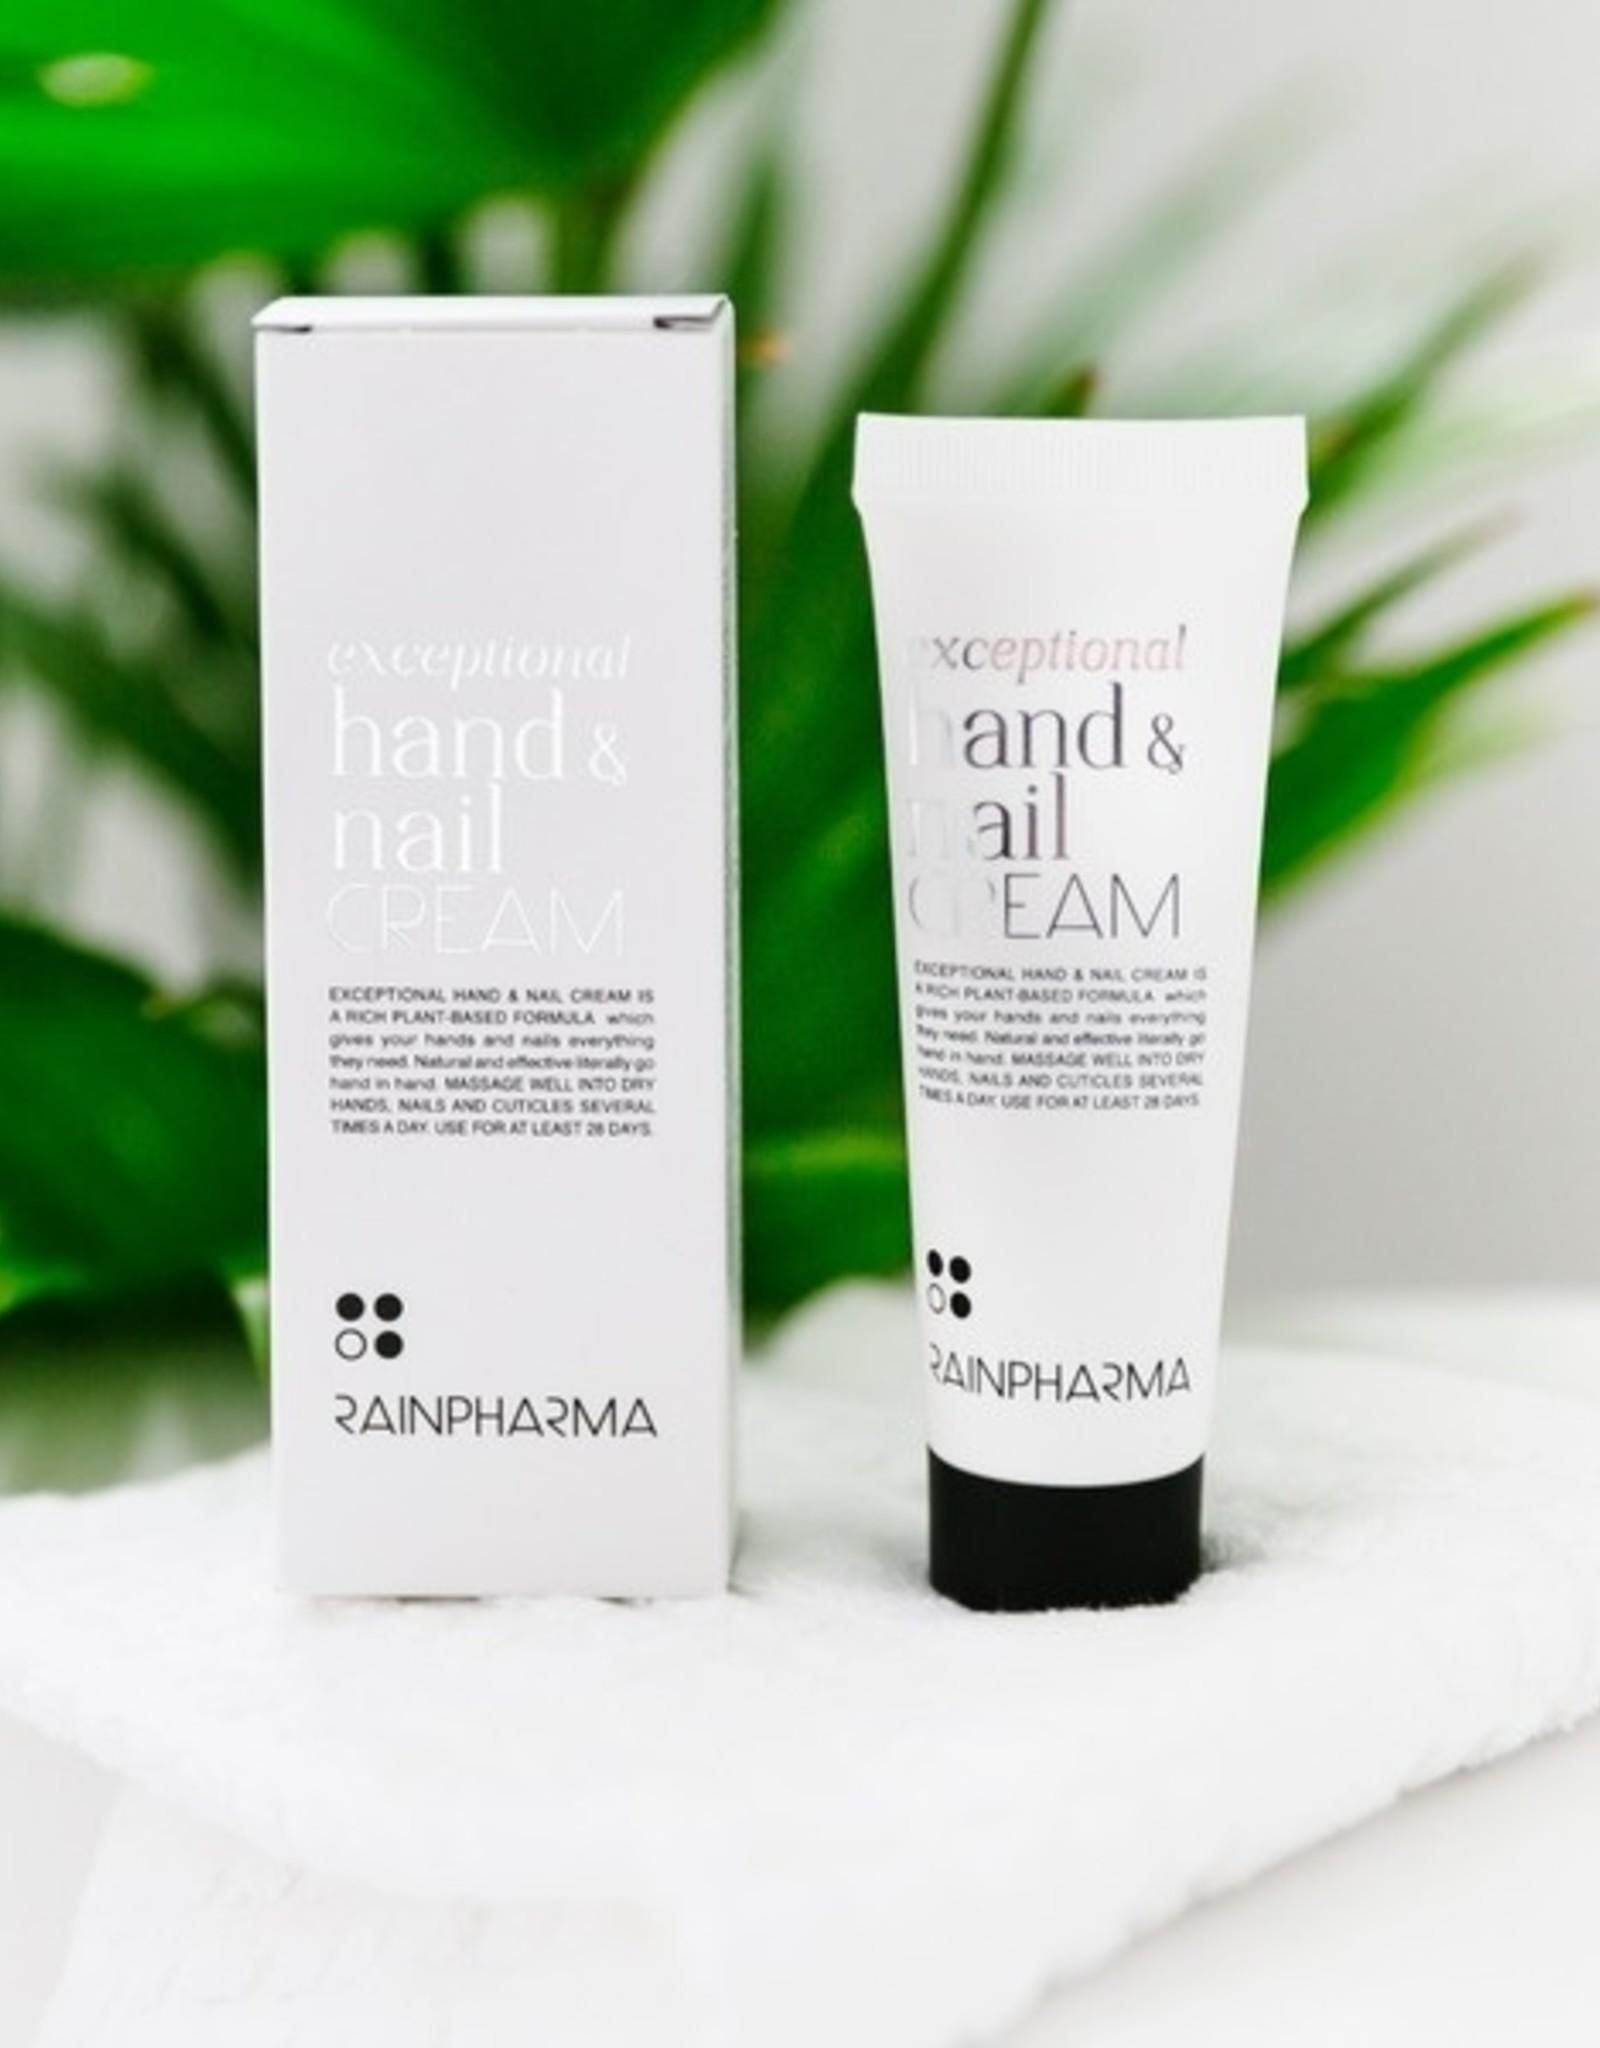 RainPharma Exceptional Hand & Nail Cream - Rainpharma